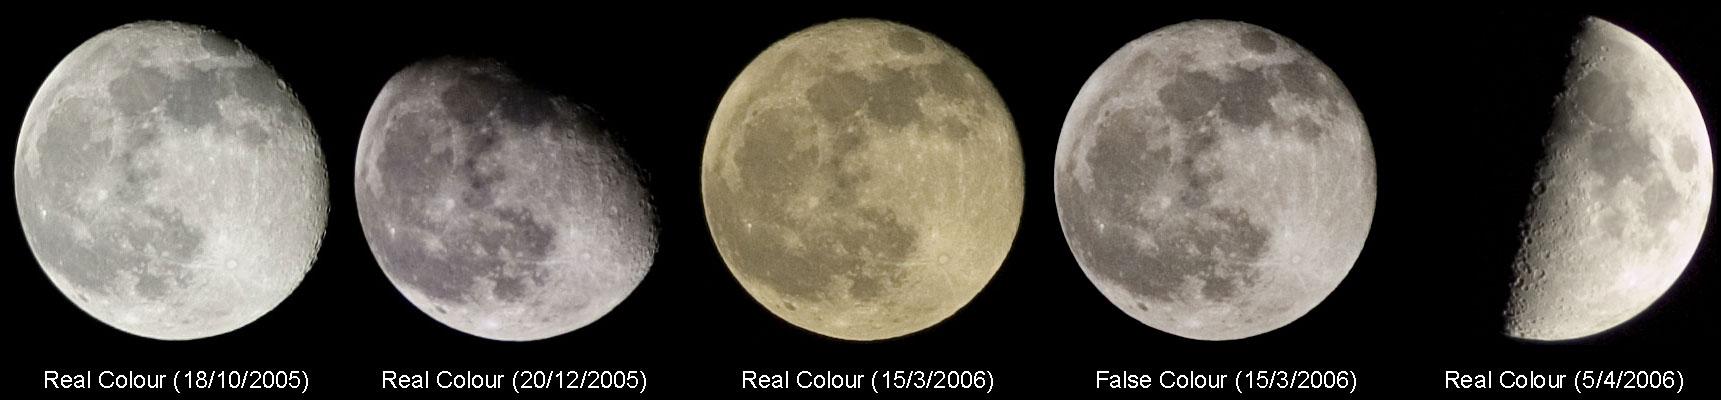 moon-pics-full